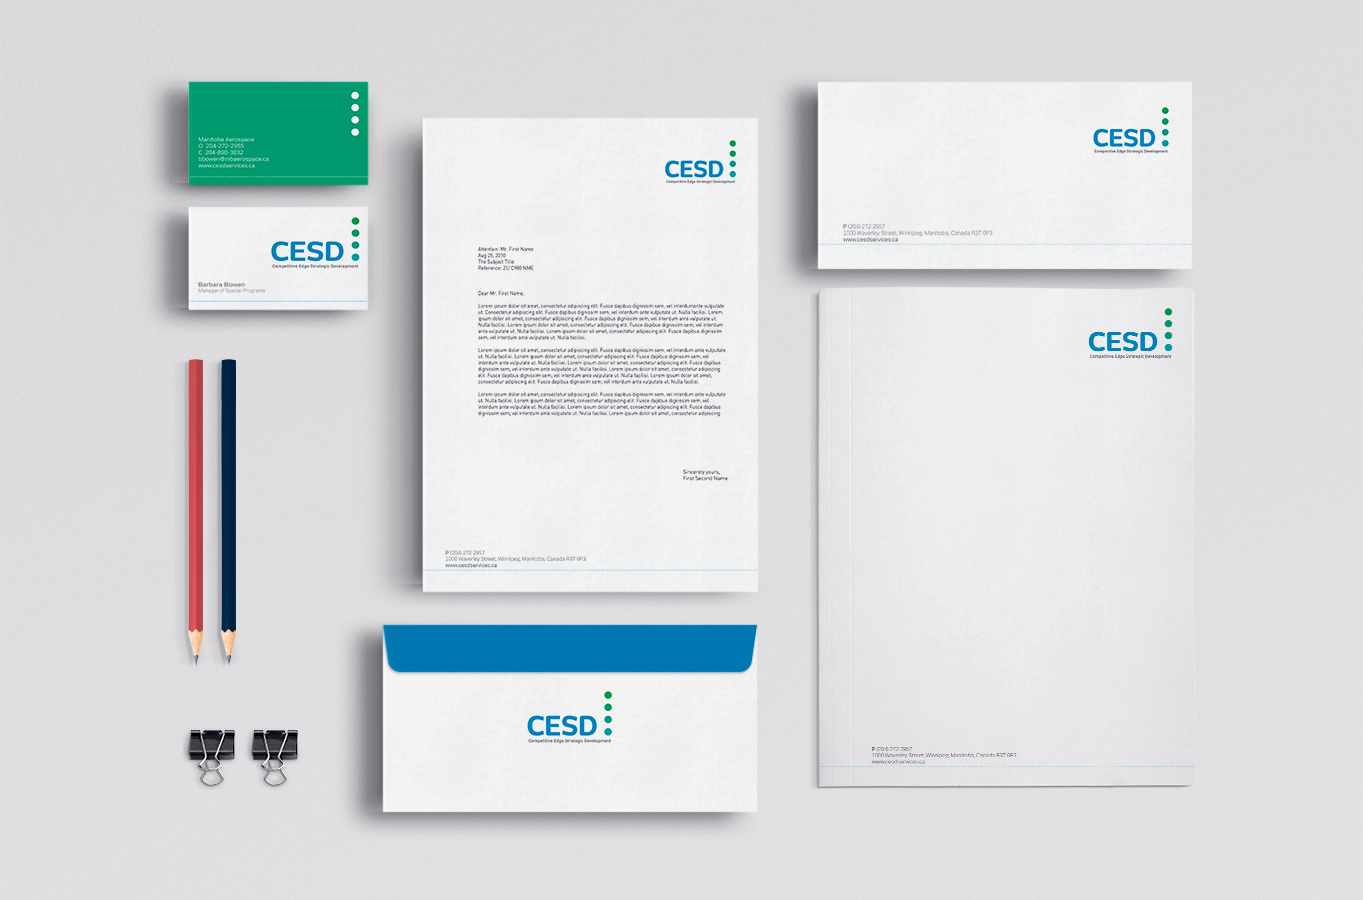 CESD Stationery